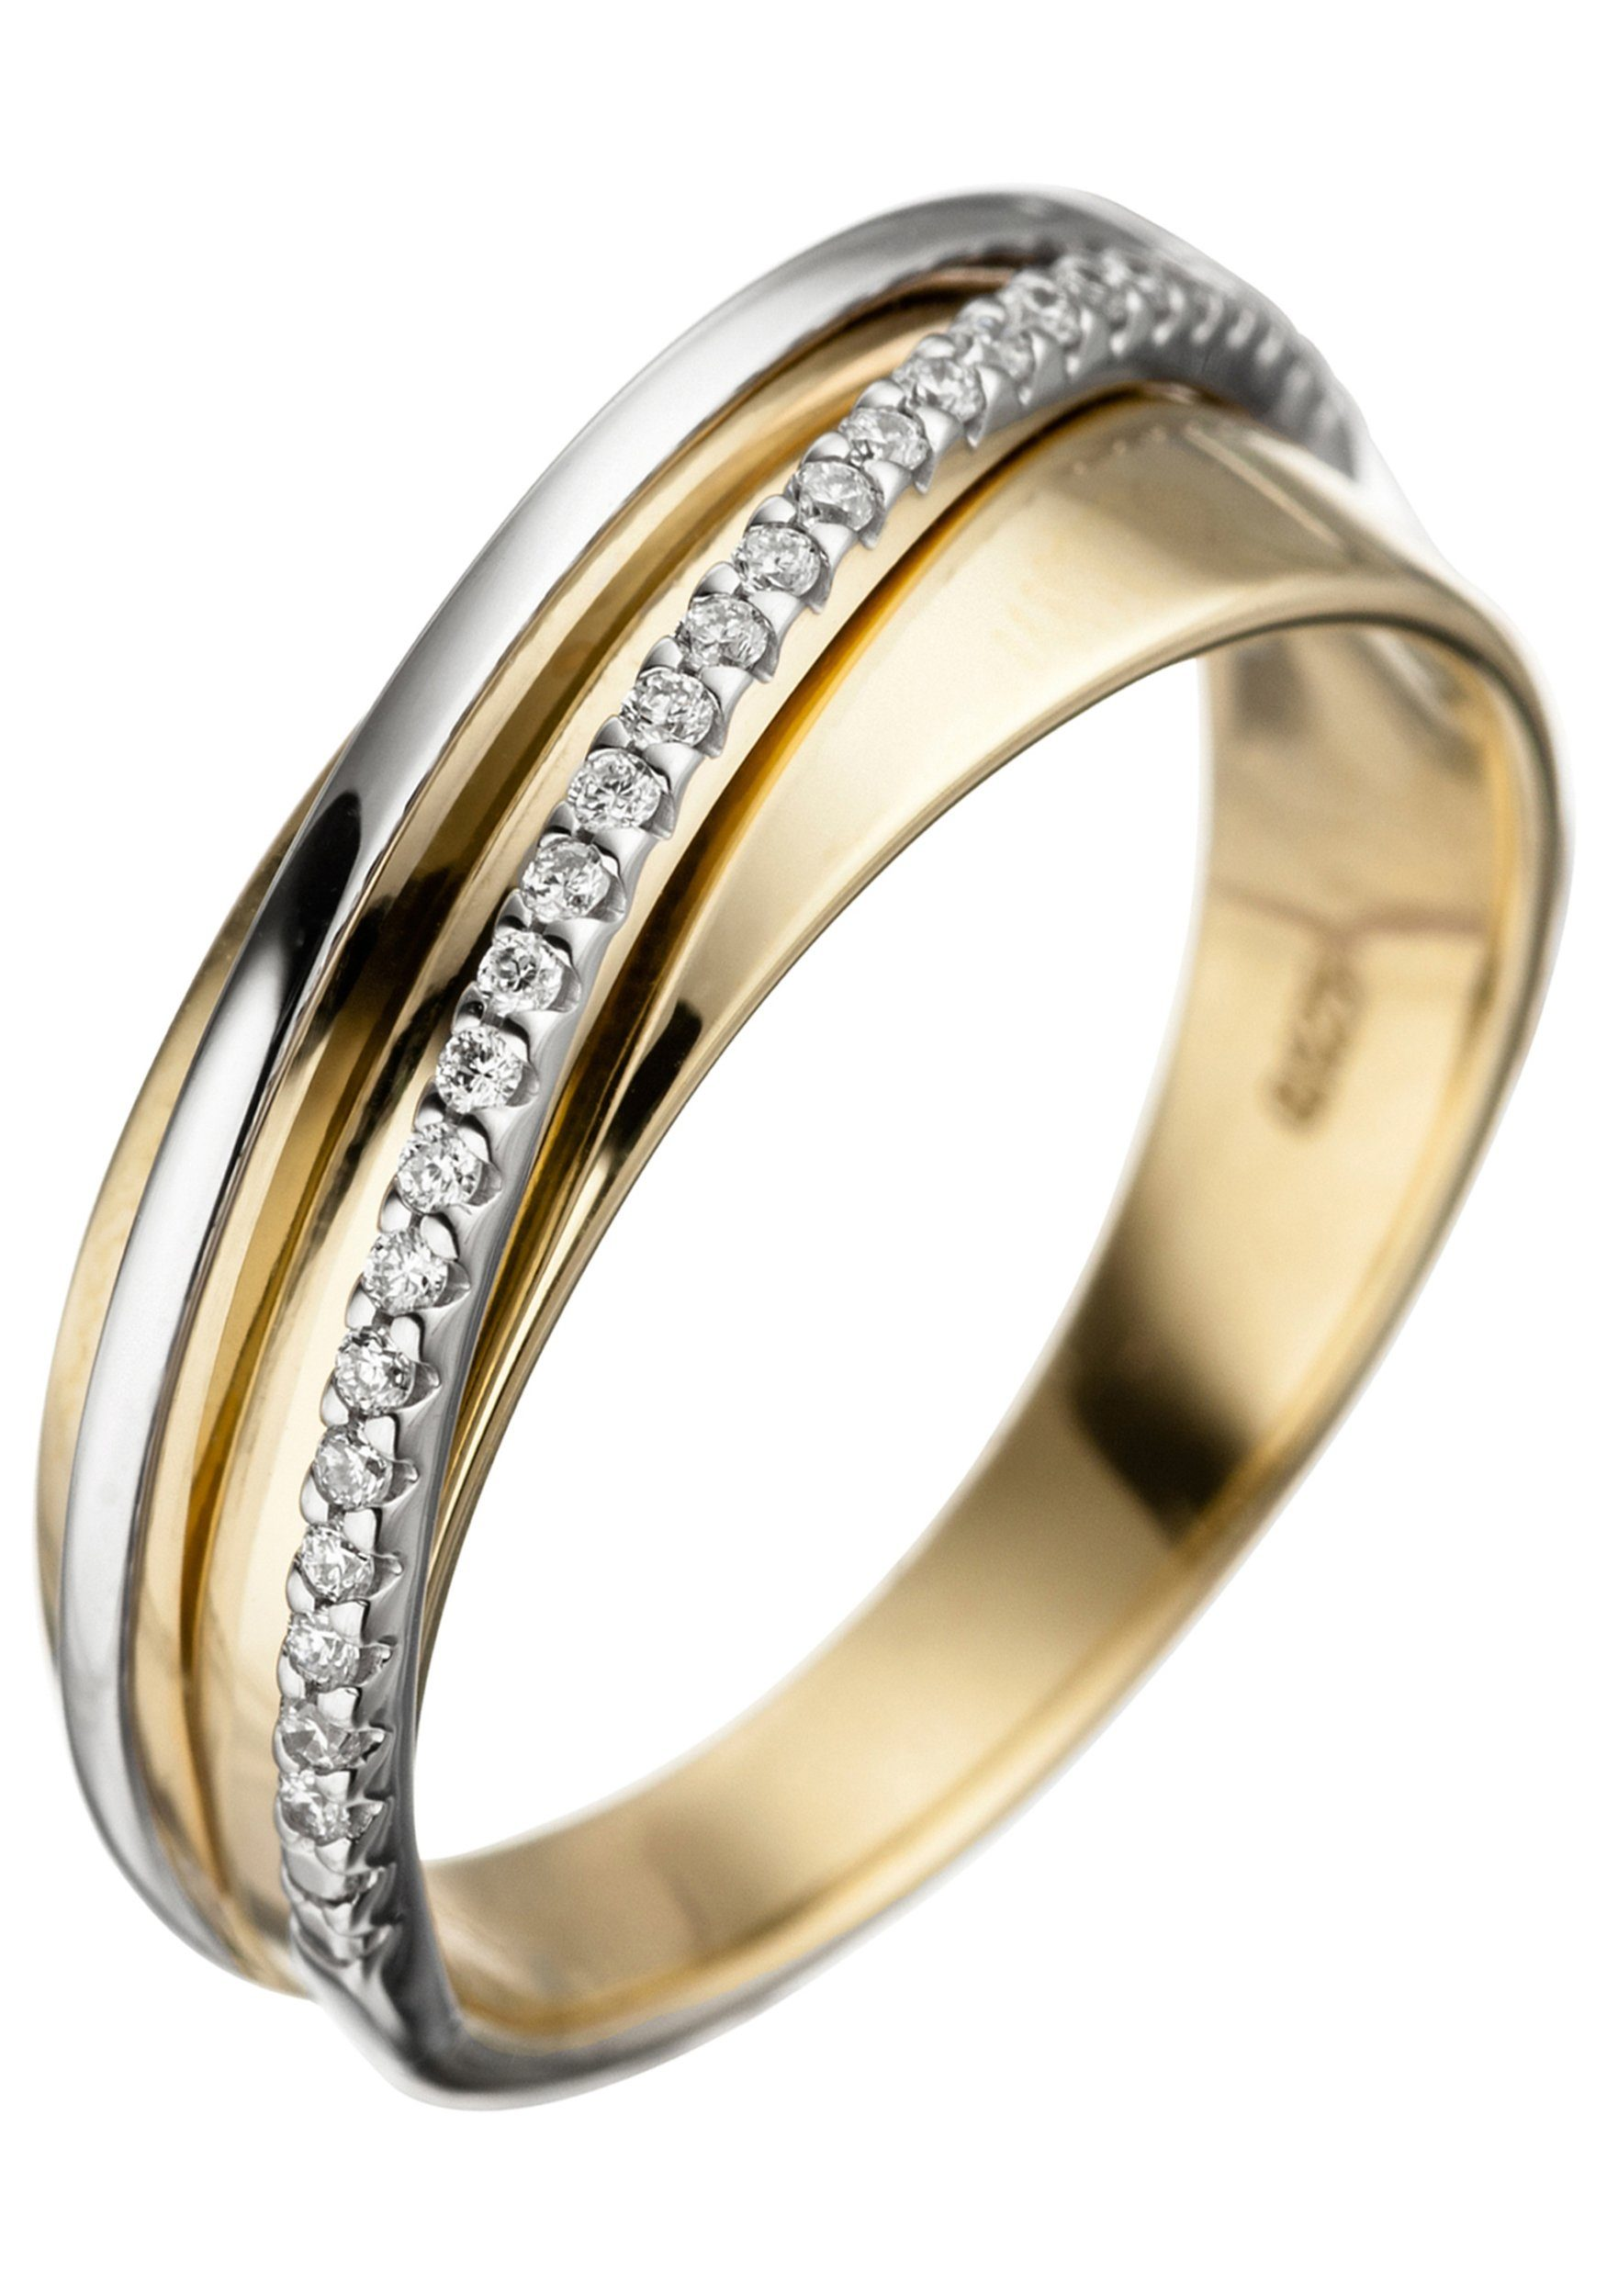 JOBO Diamantring 585 Gold bicolor mit 25 Diamanten